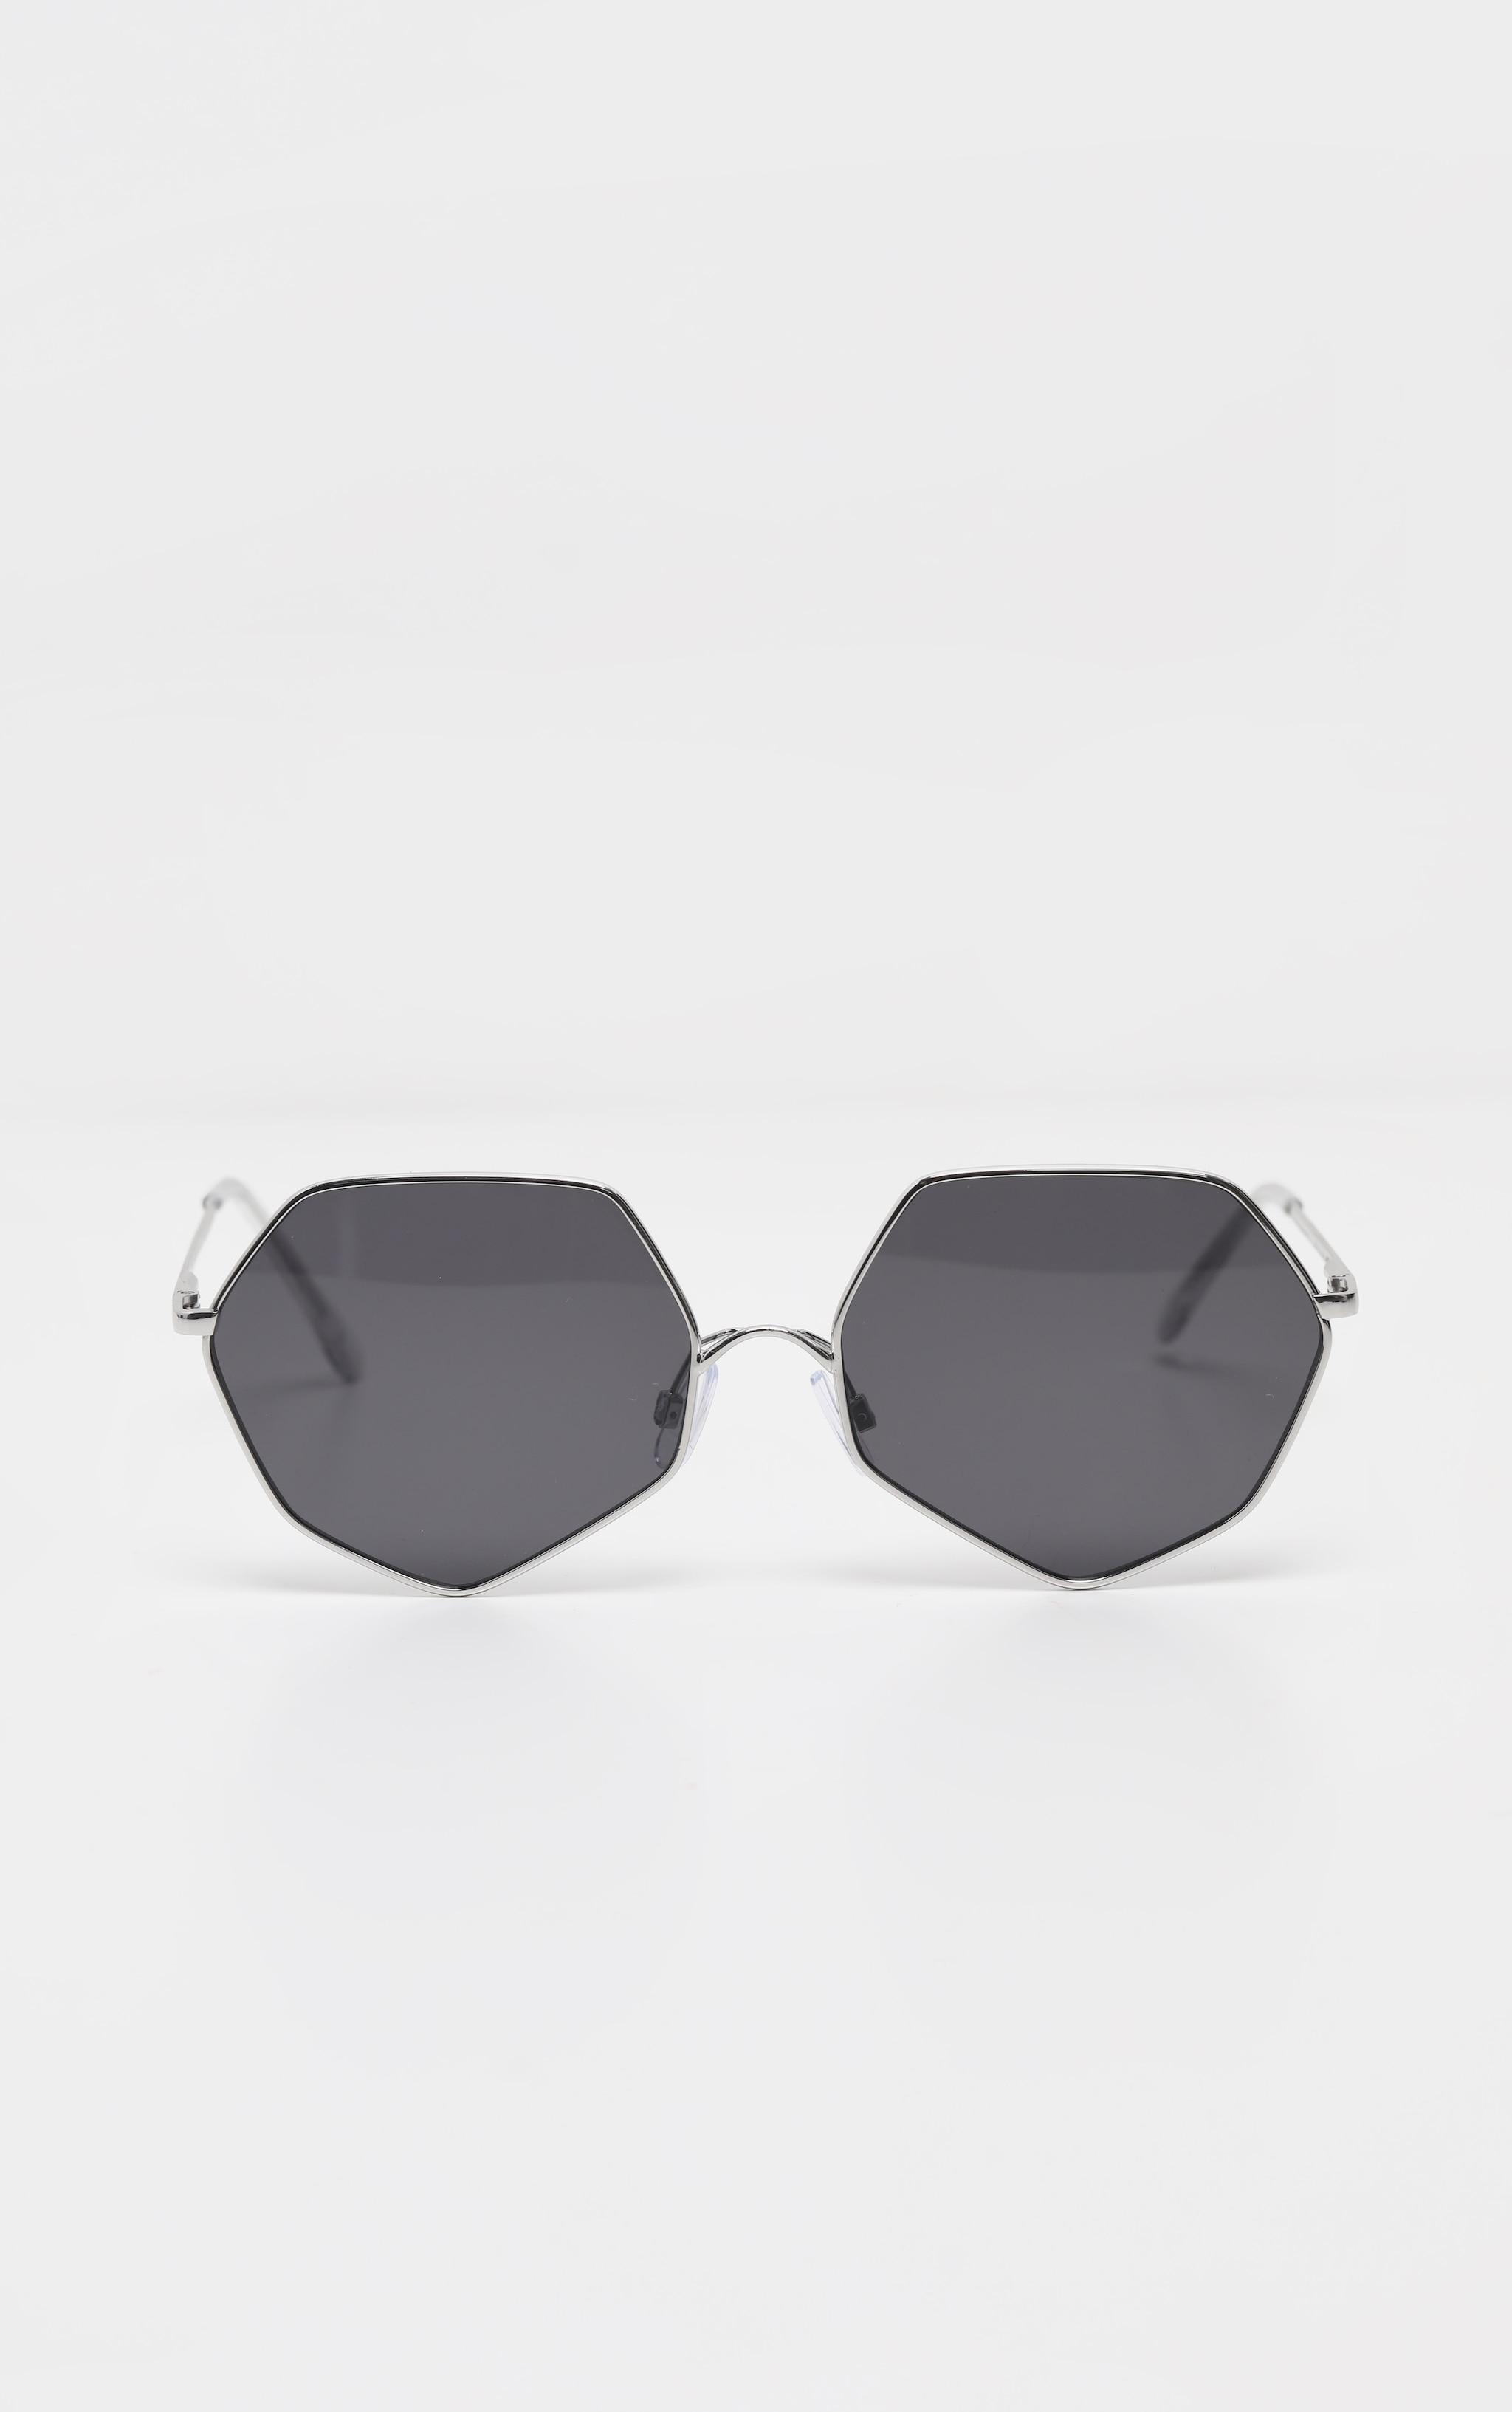 Silver Frame Black Lens Hexagon Sunglasses 2